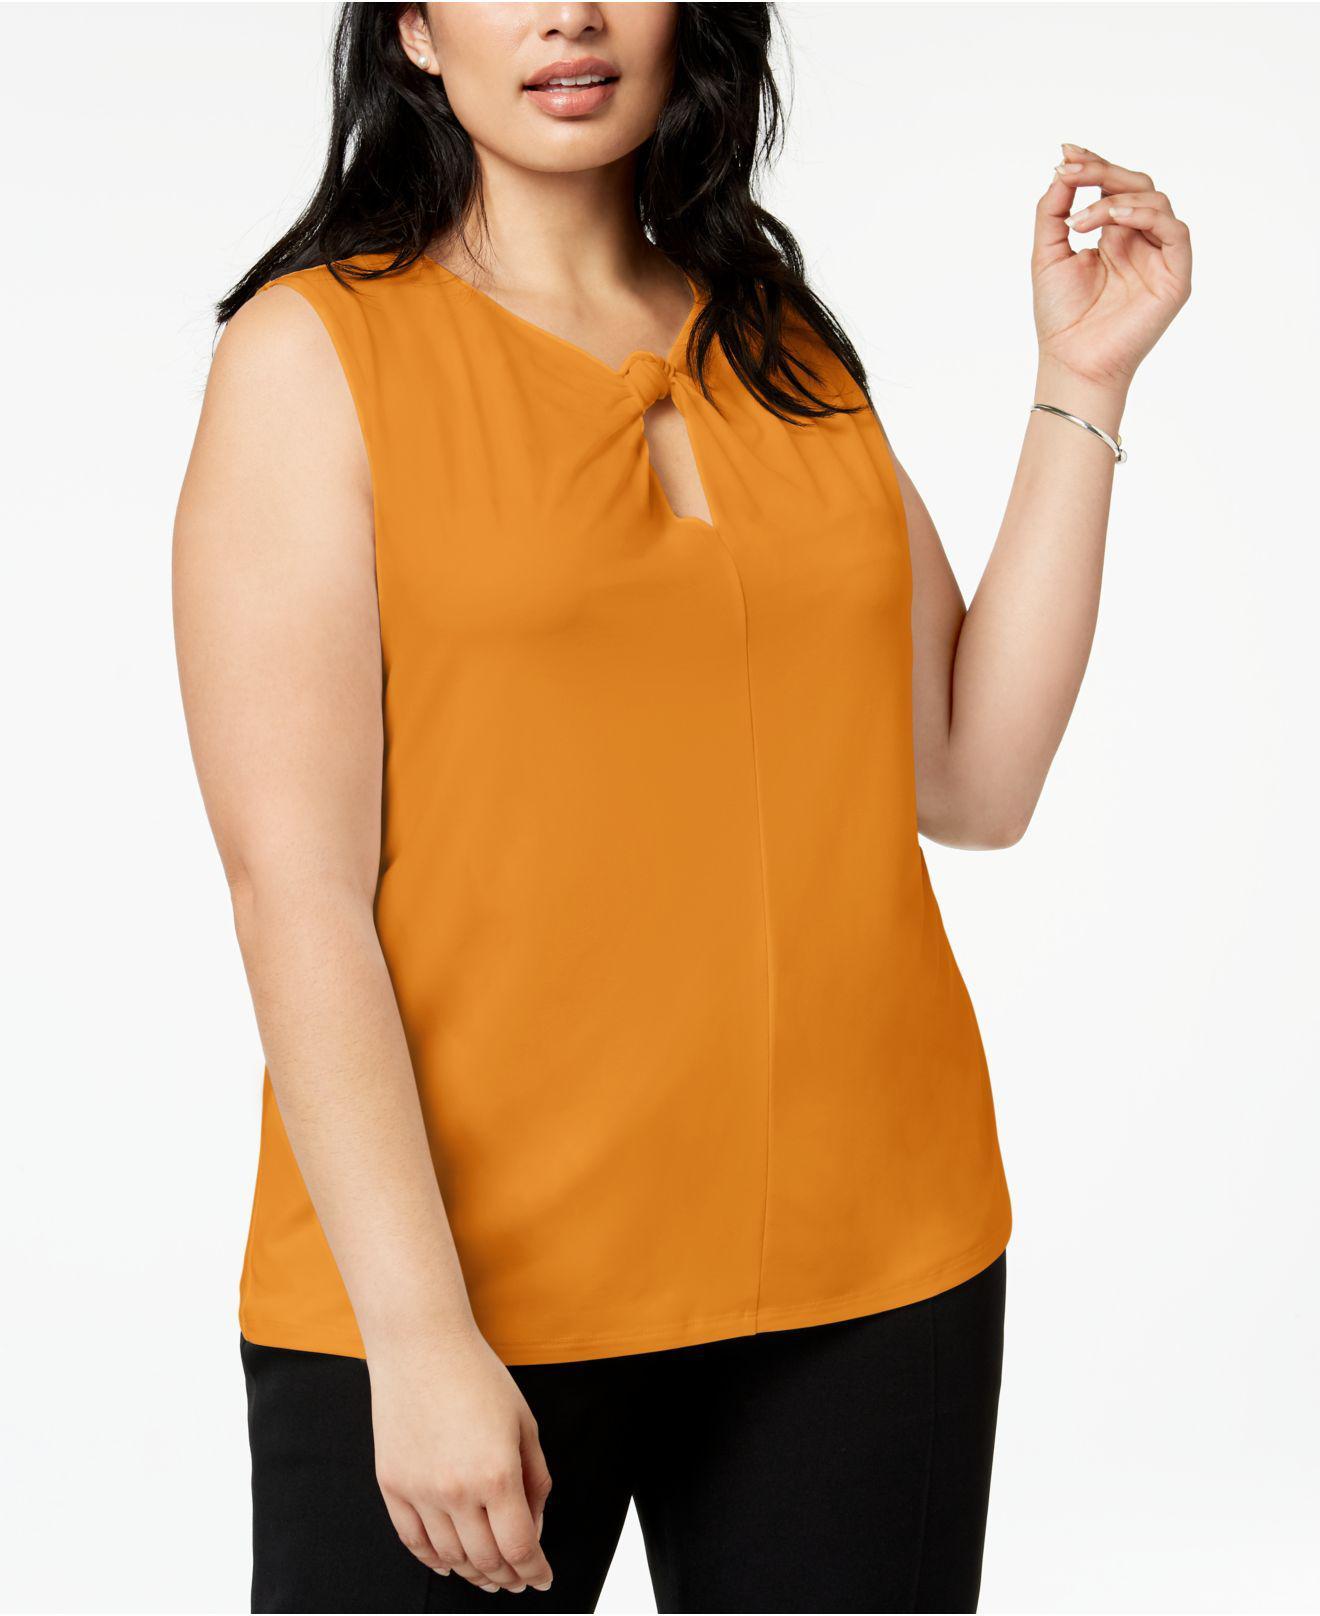 7950818f6cc Nine West Plus Size Twisted Keyhole Top in Orange - Lyst